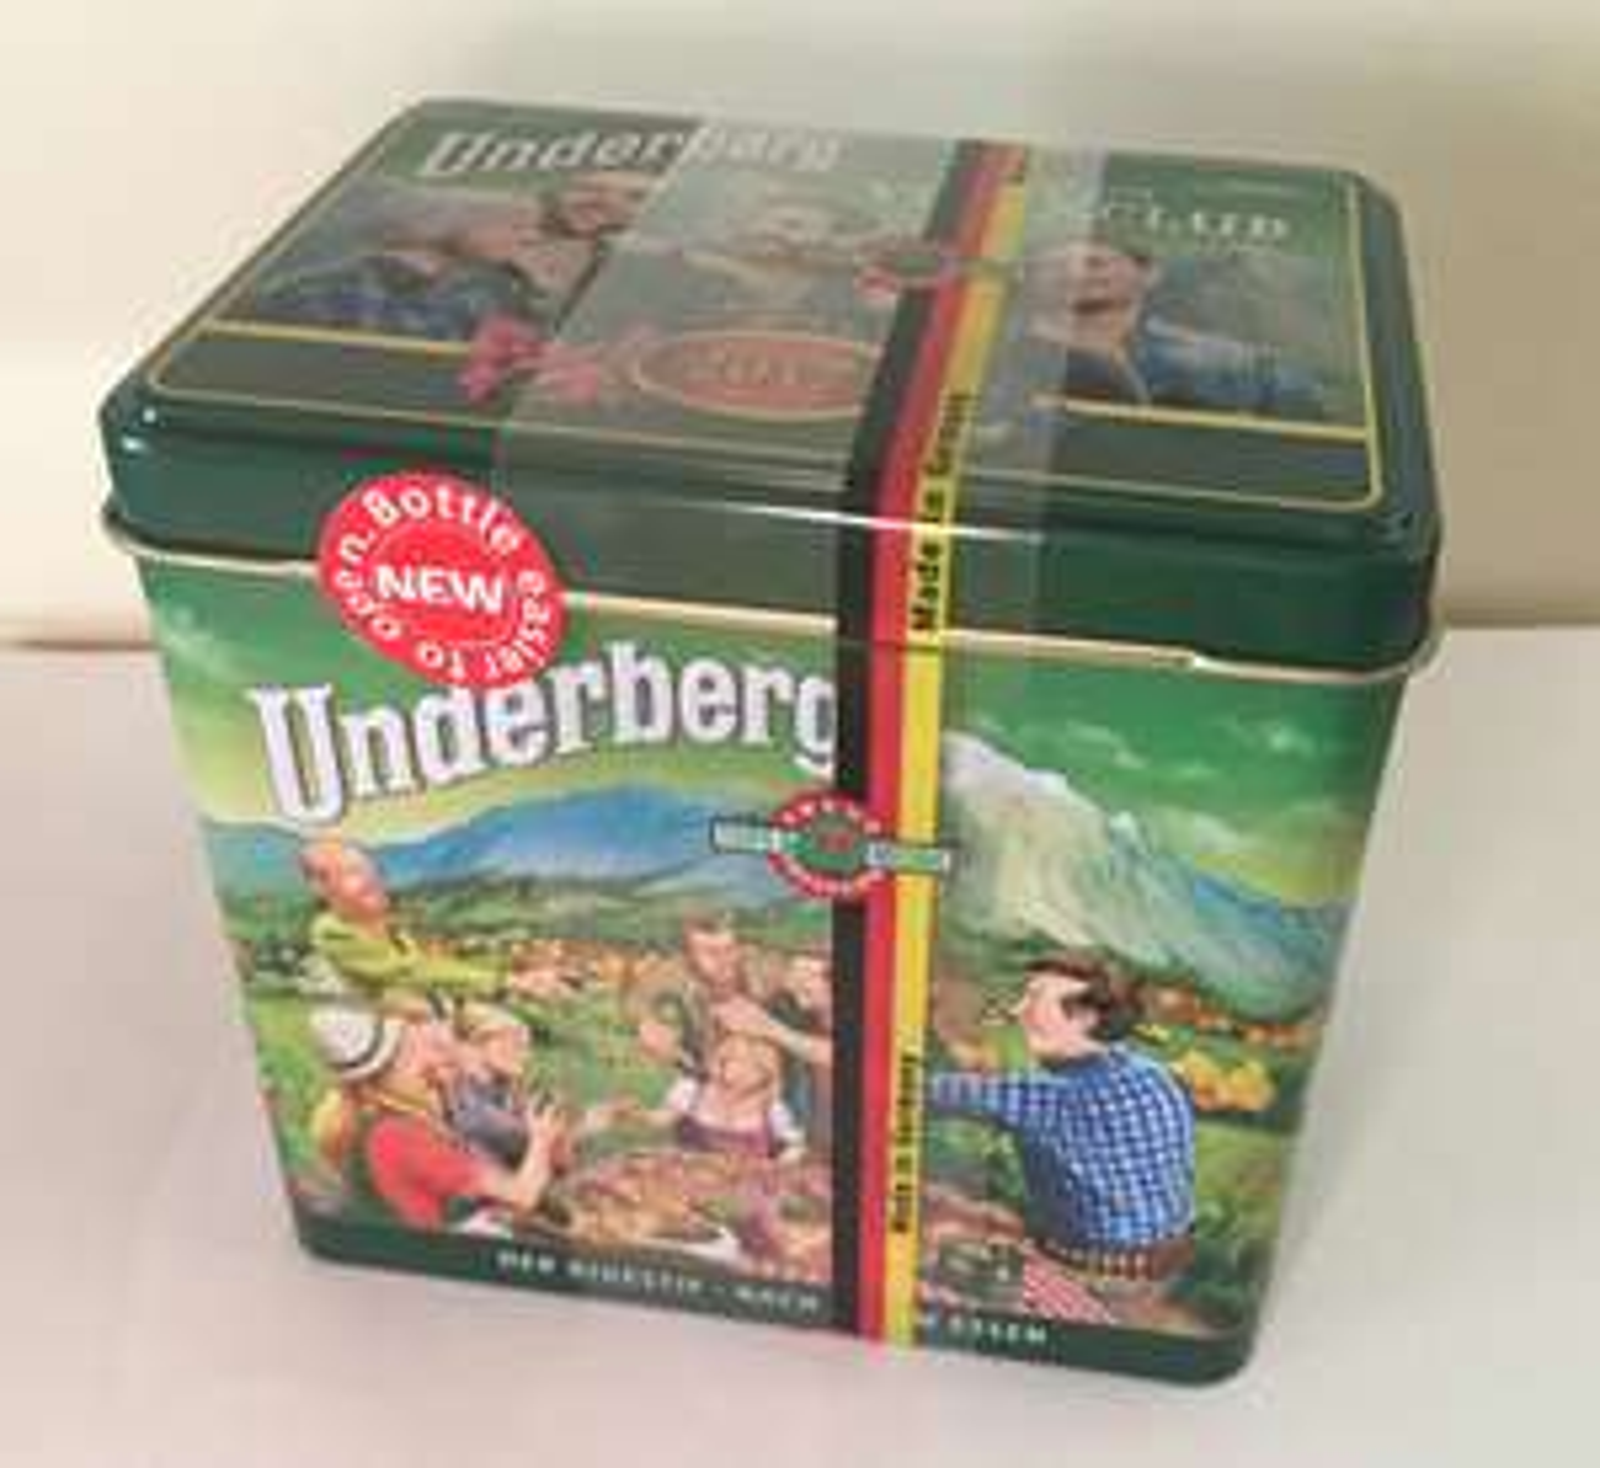 [Penny] Underberg 12er Pack 2017 Edition